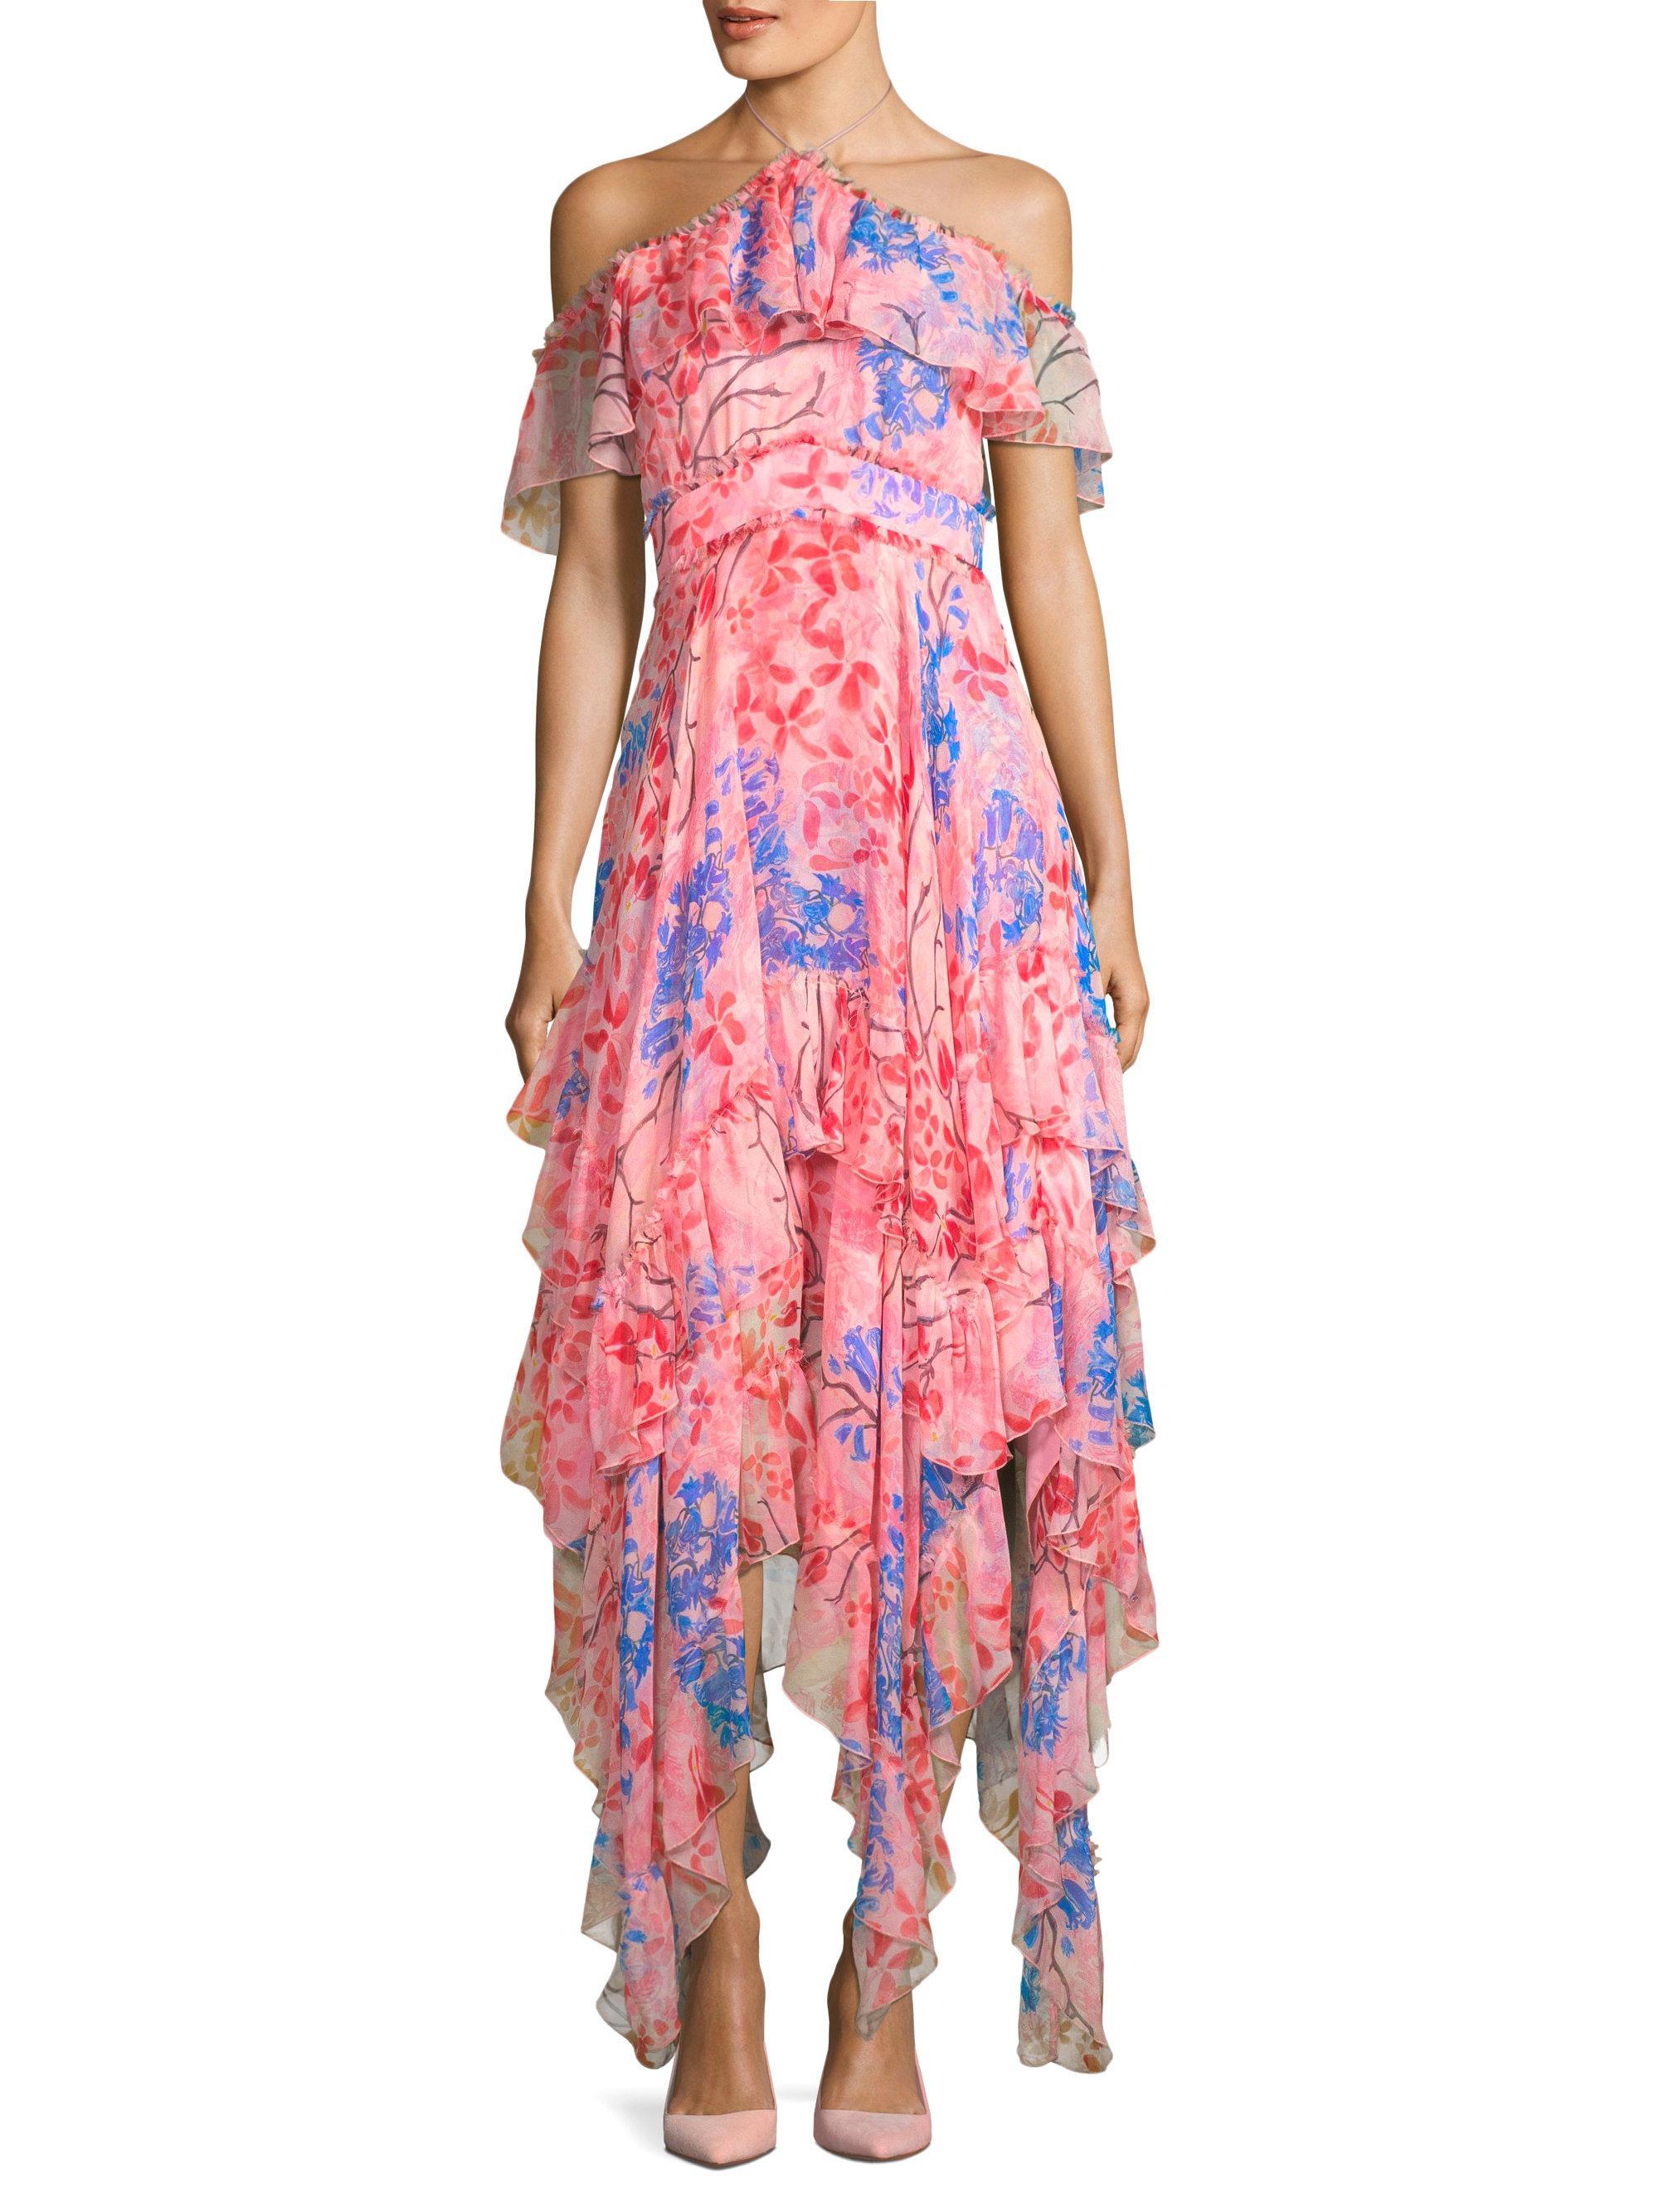 8dc72d357d Alice + Olivia Galina Handkerchief Maxi Dress in Pink - Lyst